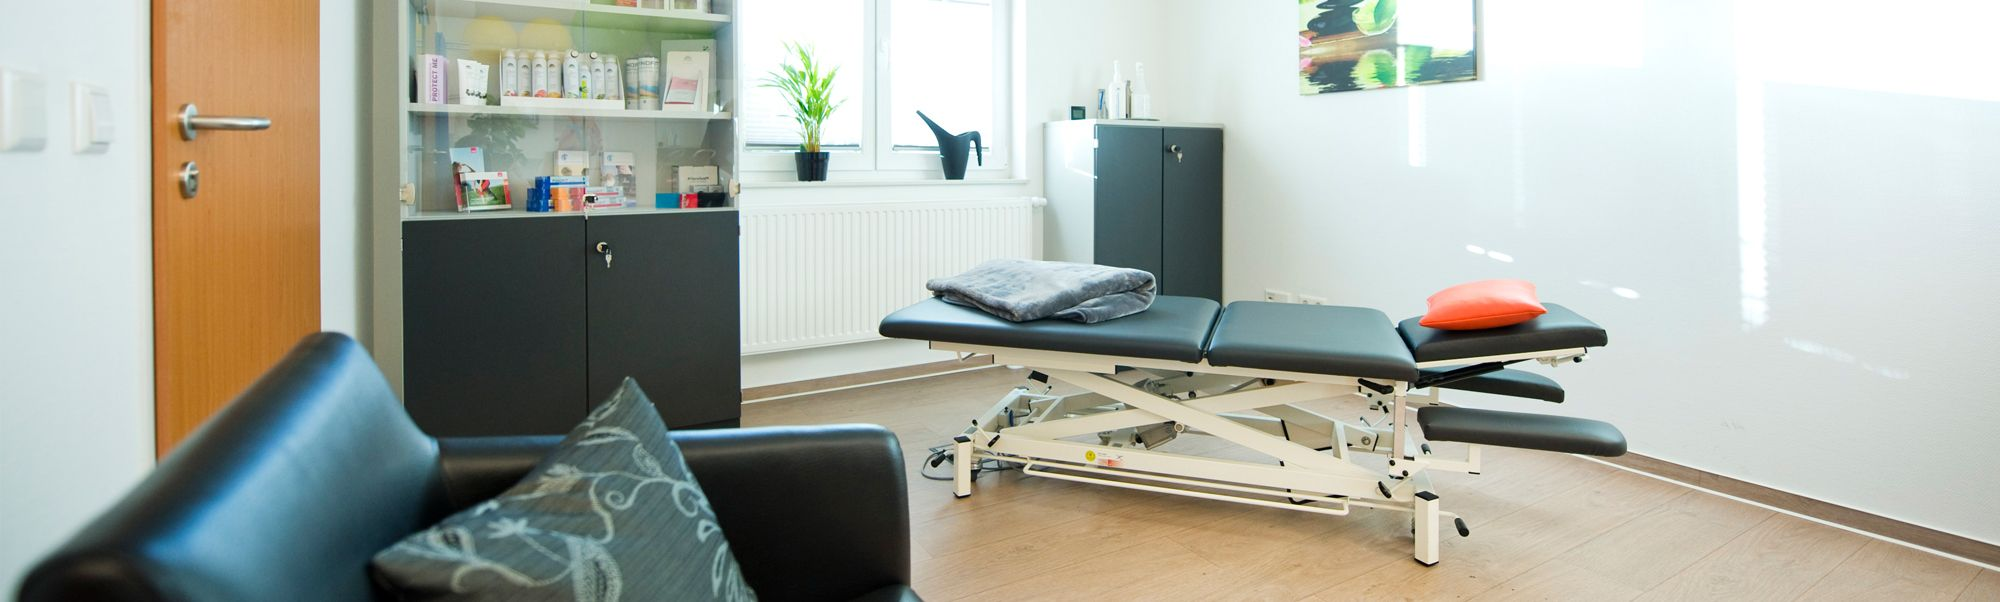 Praxis im Wiehen Park | Behandlung